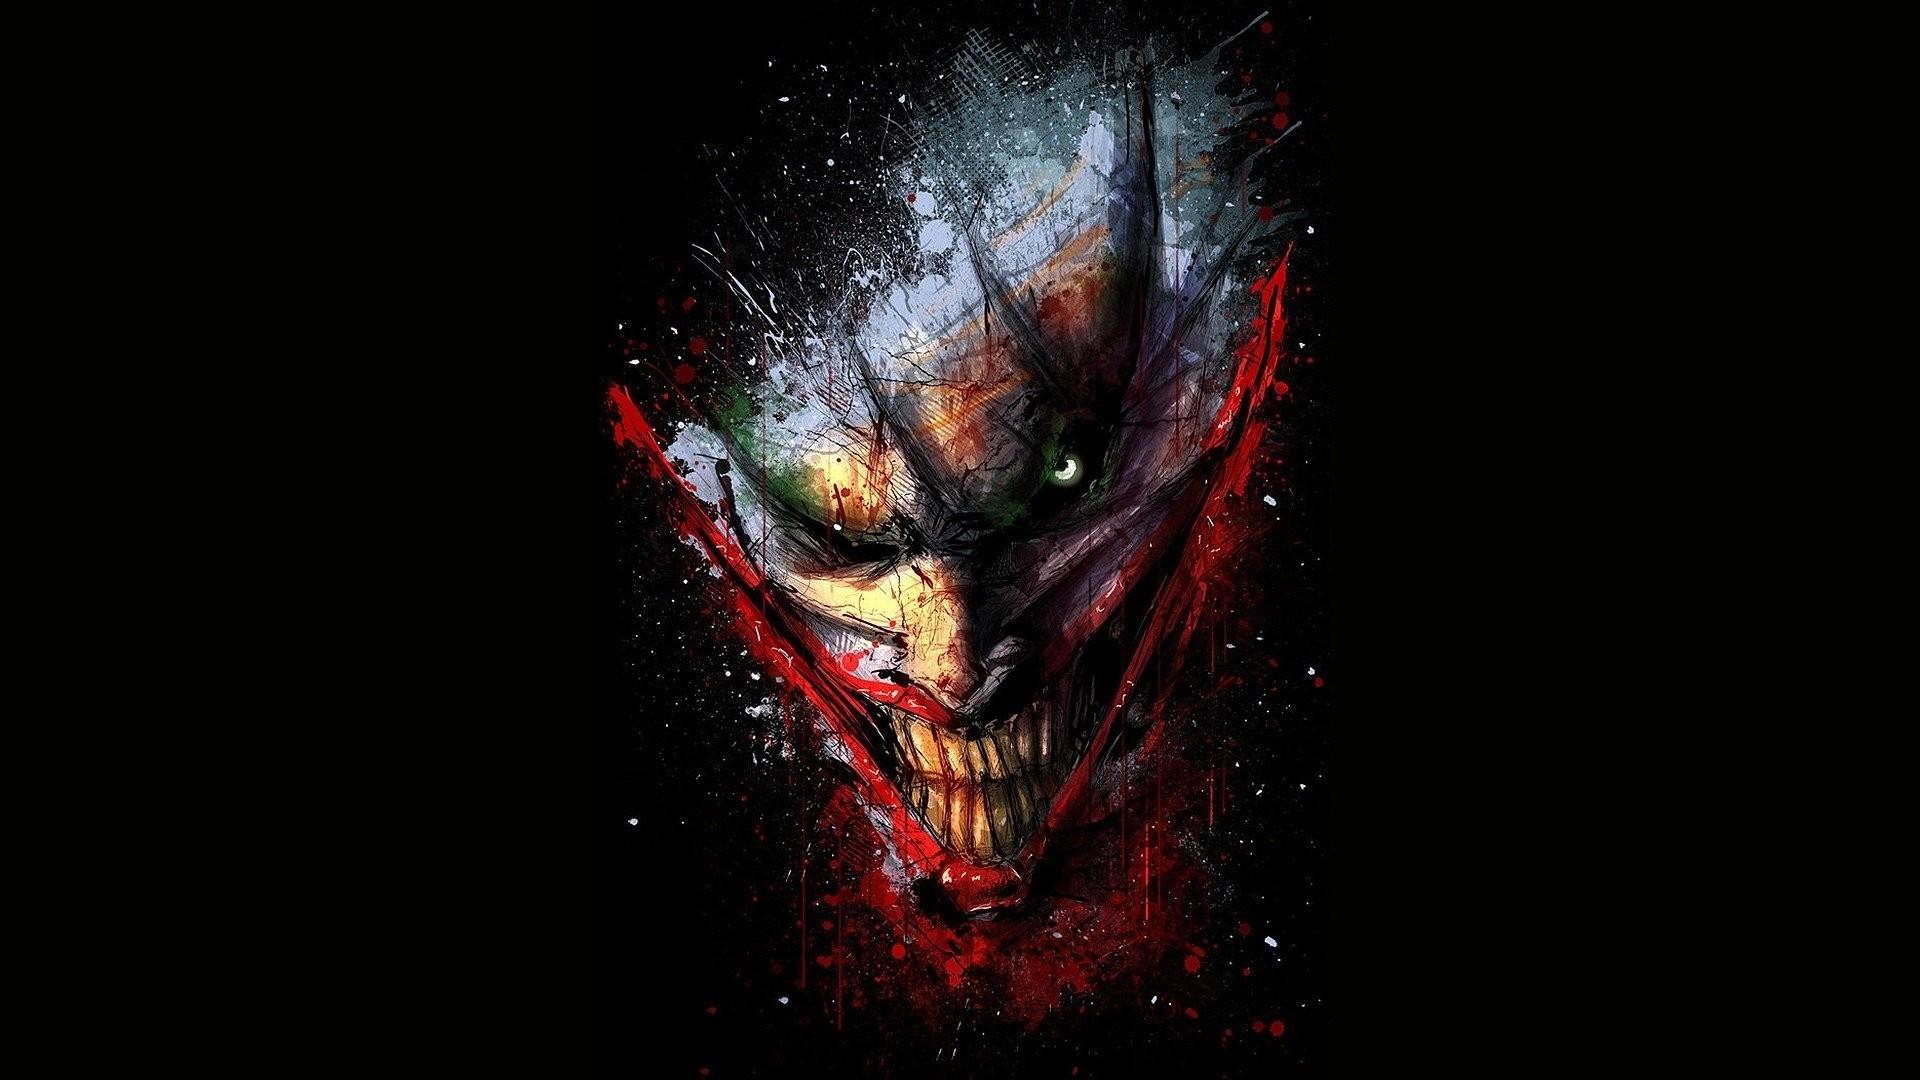 Evil Joker Wallpapers Hd Wallpaper Collections